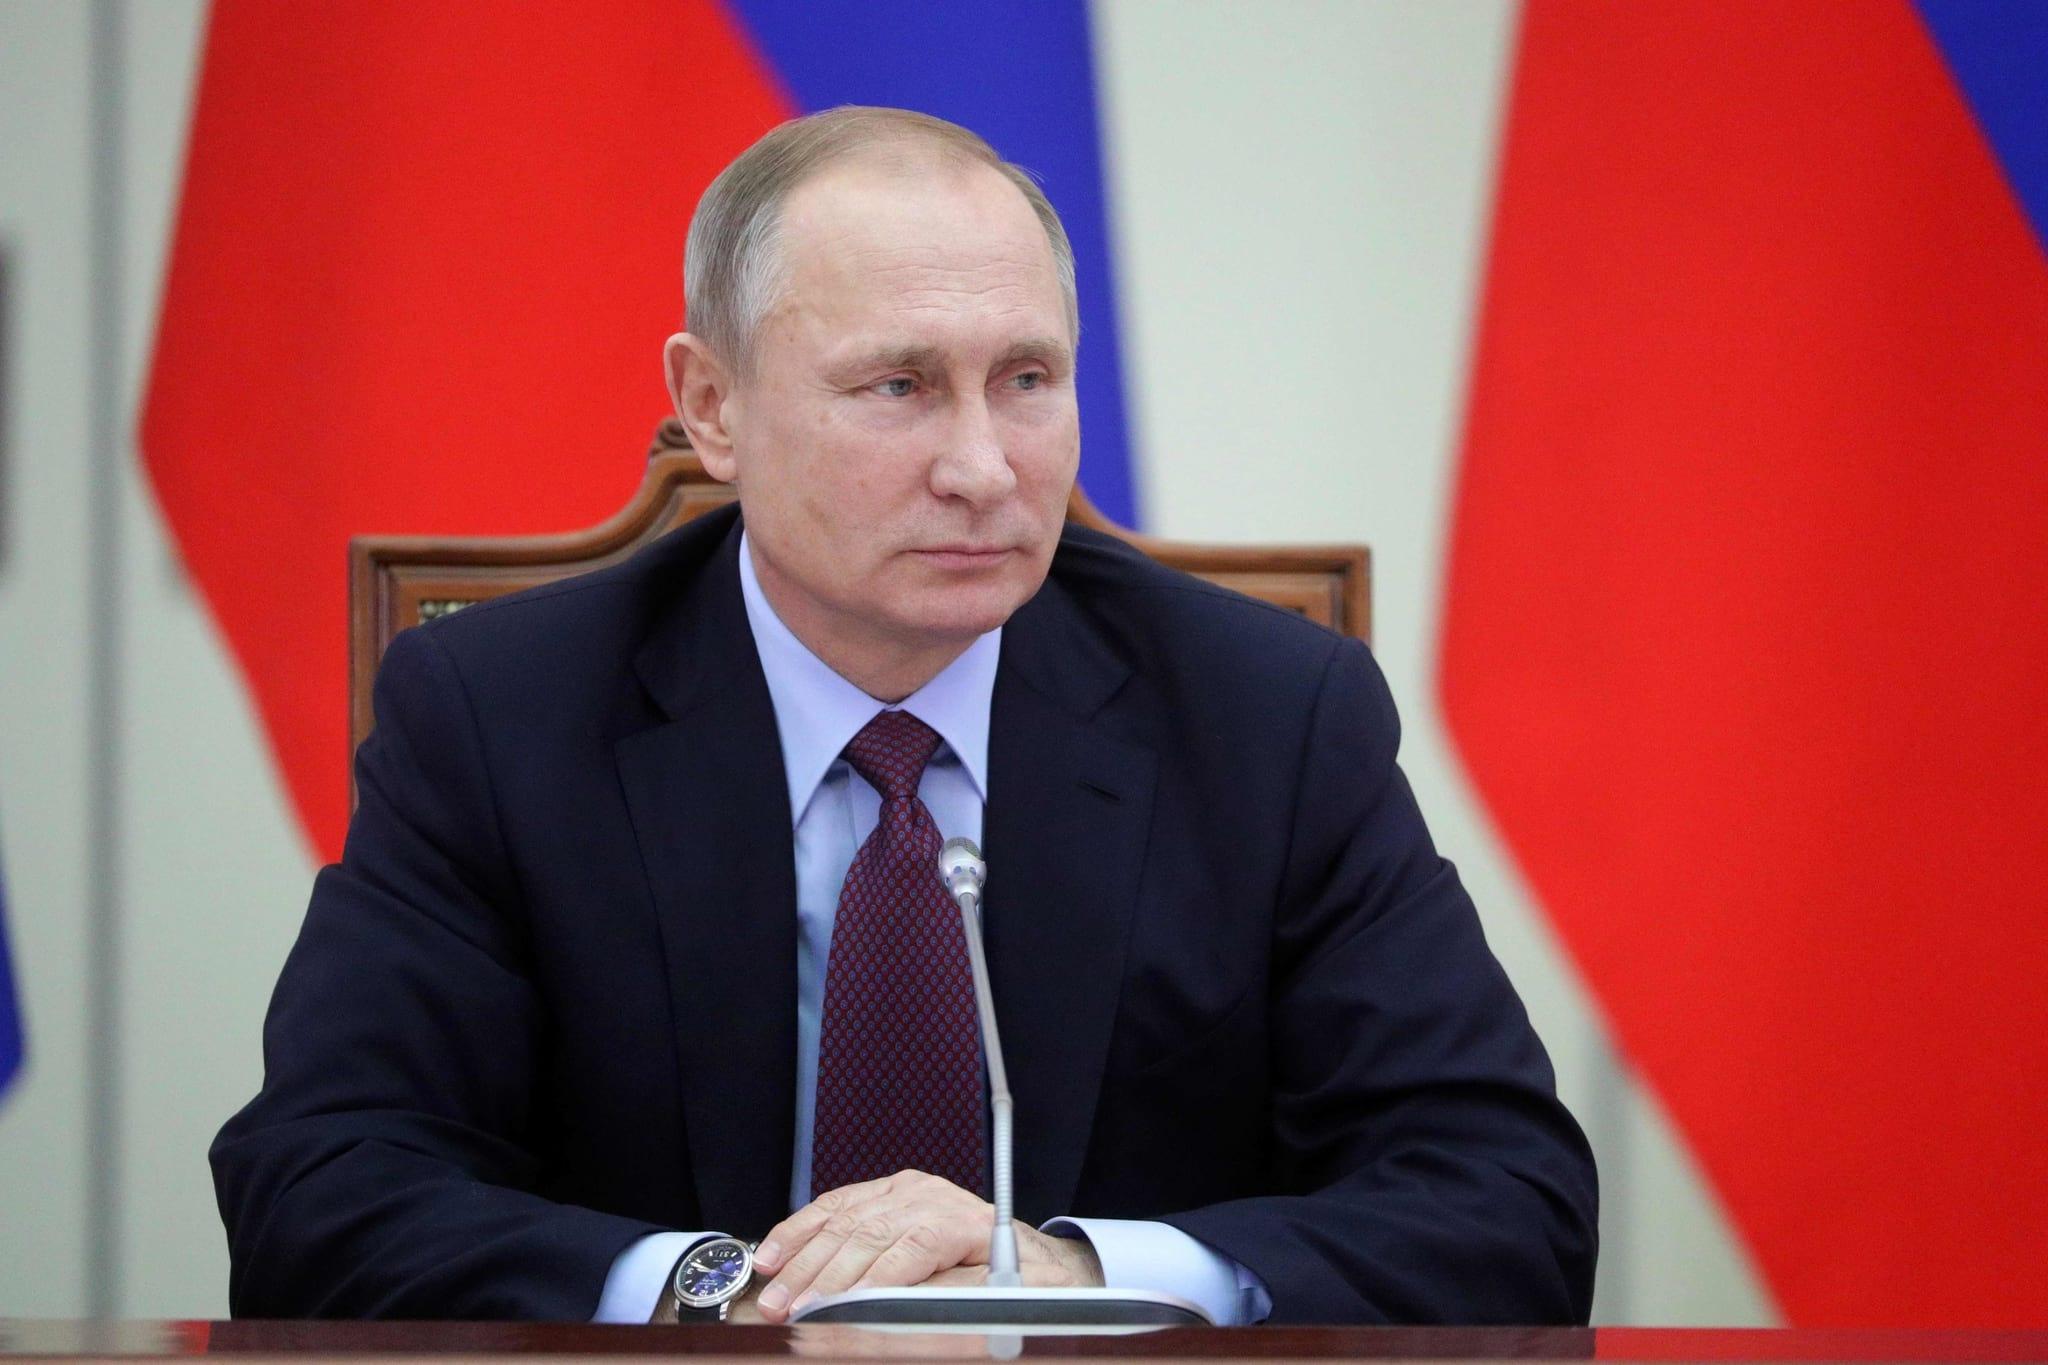 PÚBLICO - Rússia aperta controlo da Internet